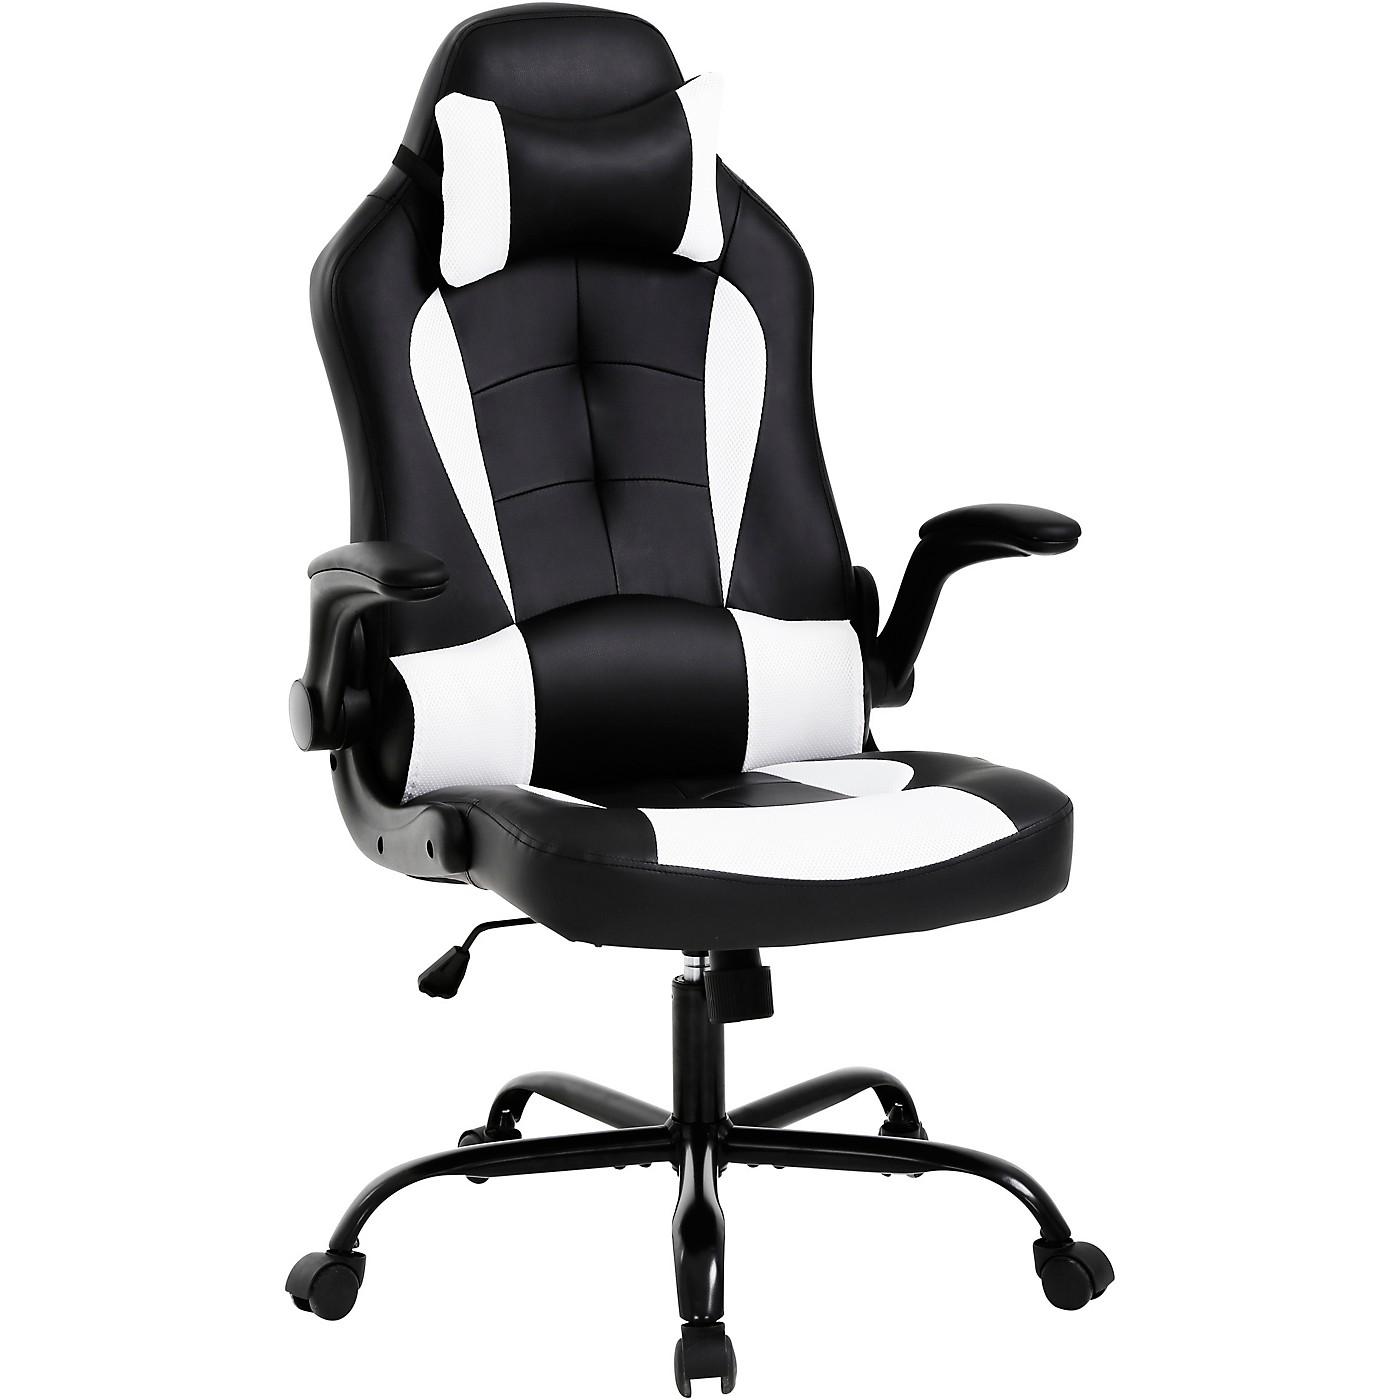 ProHT Ergonomic Gaming Chair thumbnail